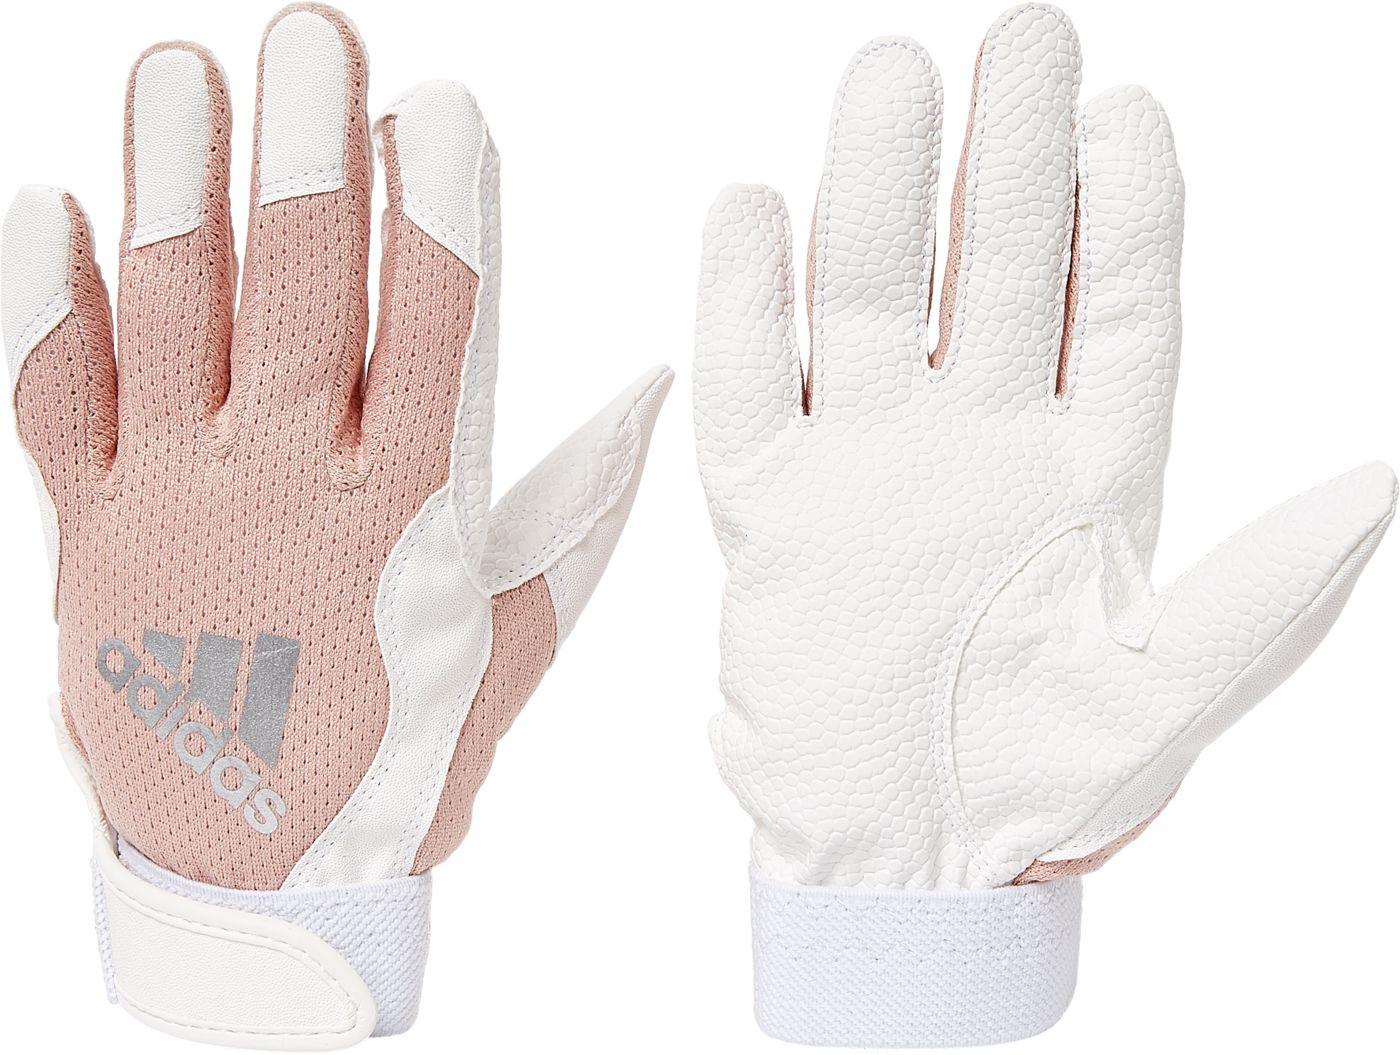 adidas Girls' T-Ball Batting Gloves 2020